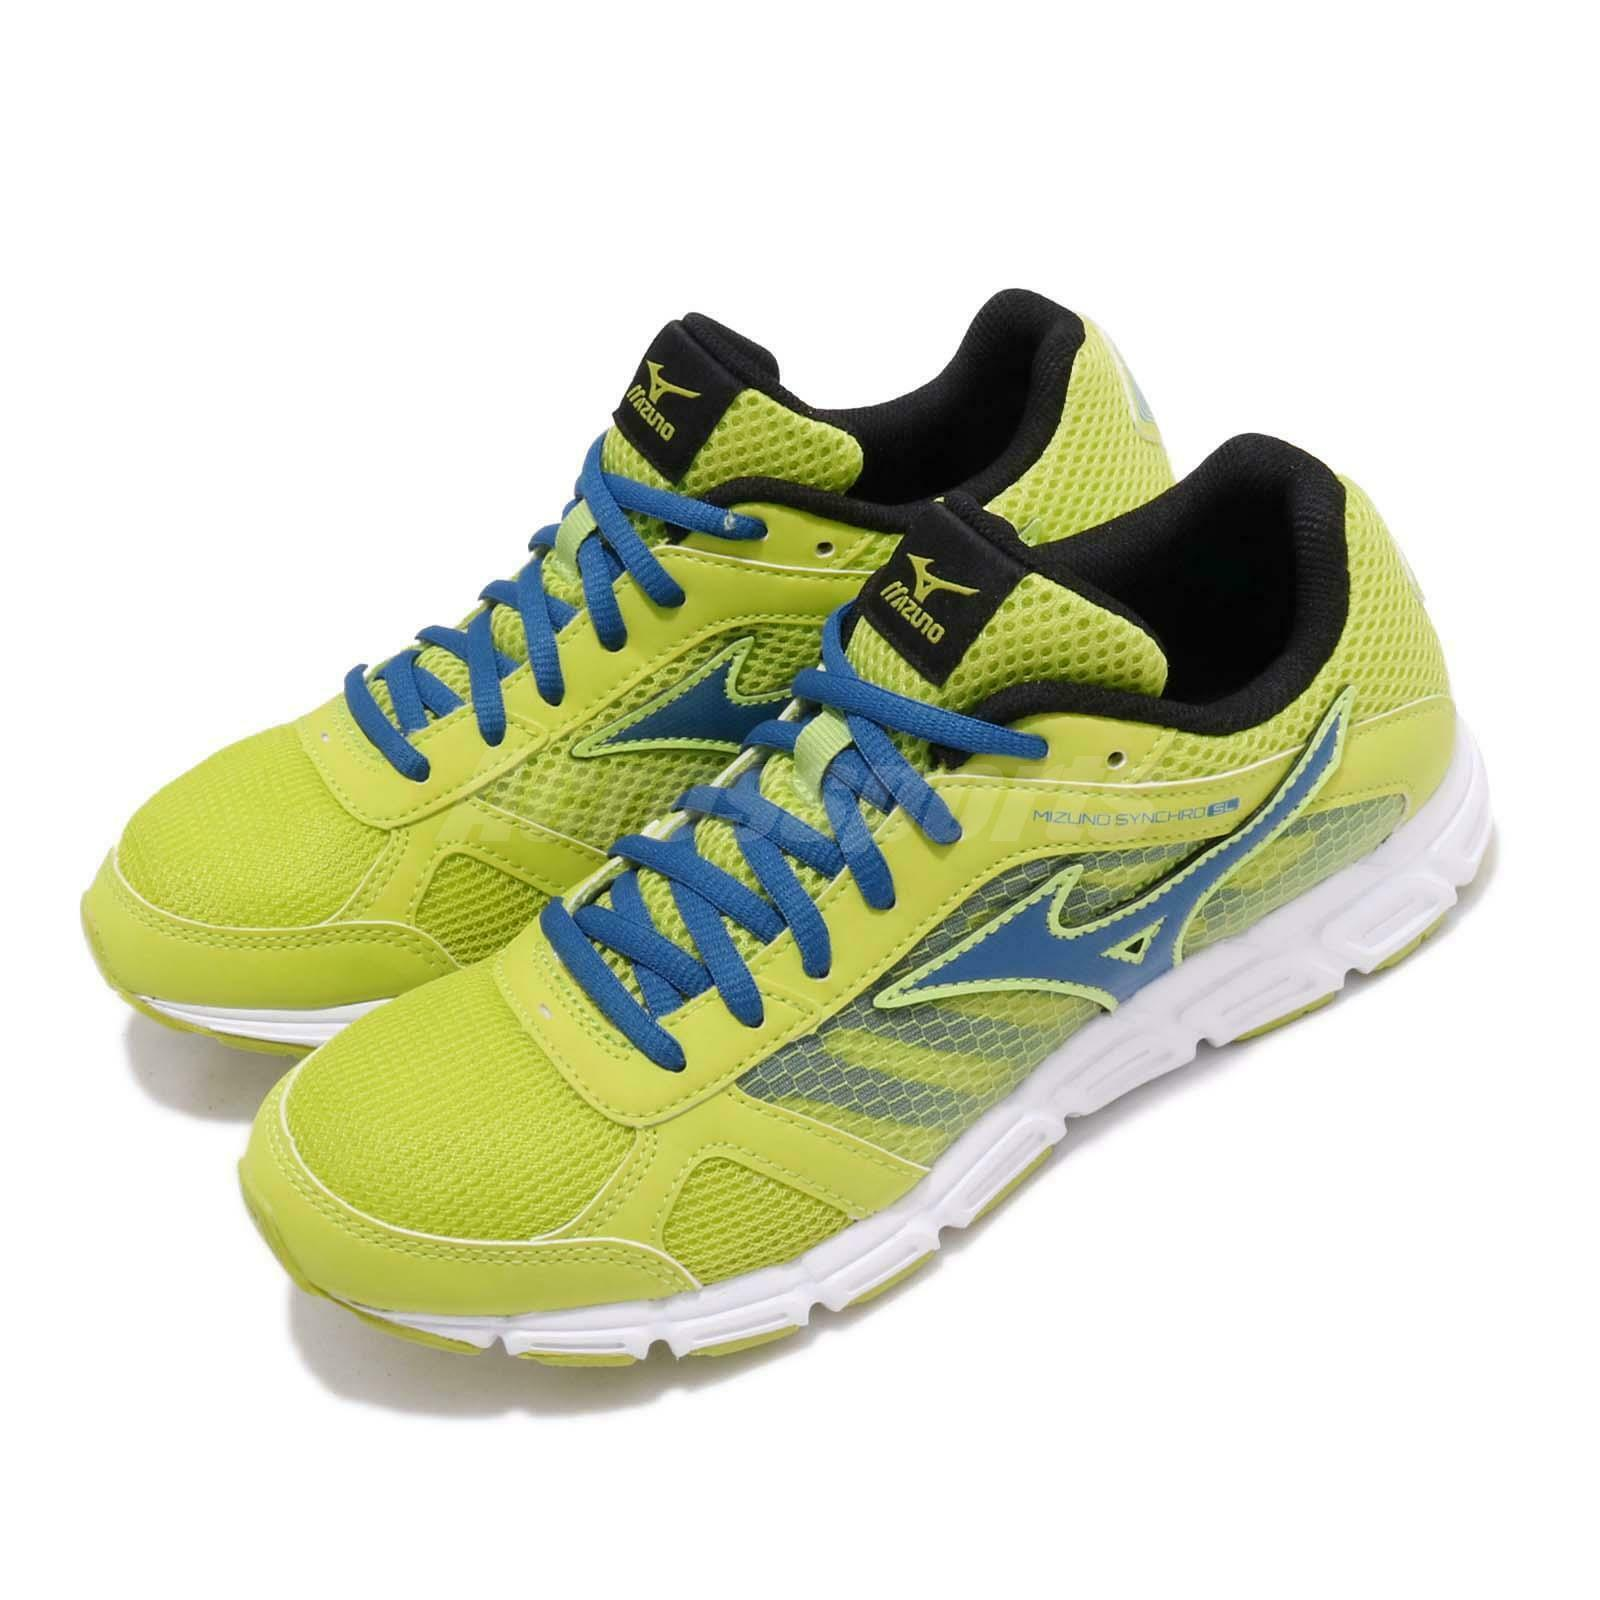 Mizuno Synchro SL amarillo verde azul blanco Men Running zapatos zapatillas J1GR1628-74